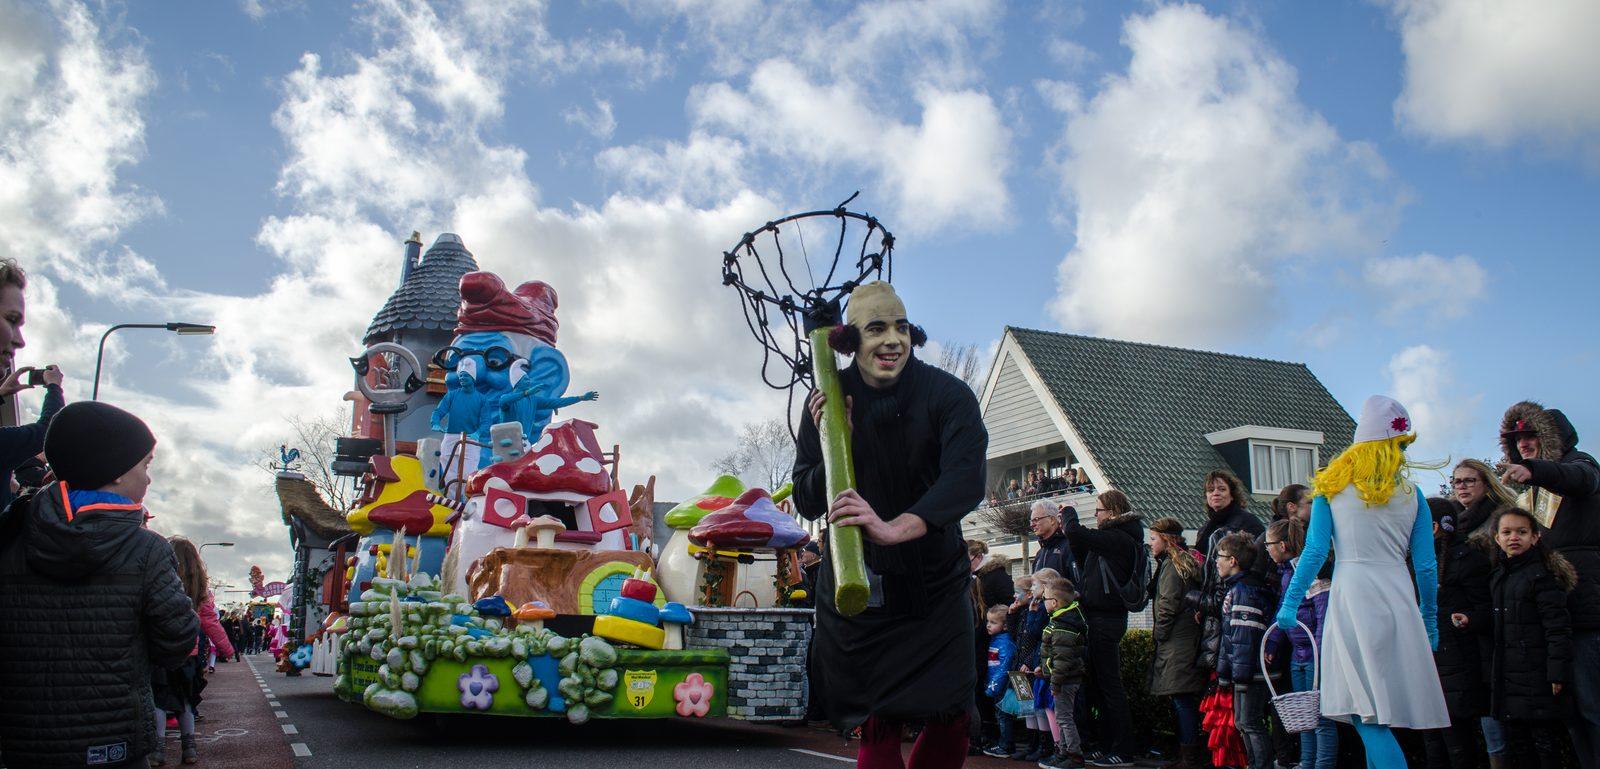 Optocht en prijsuitreiking Carnaval Zwaag via OnsWestfriesland